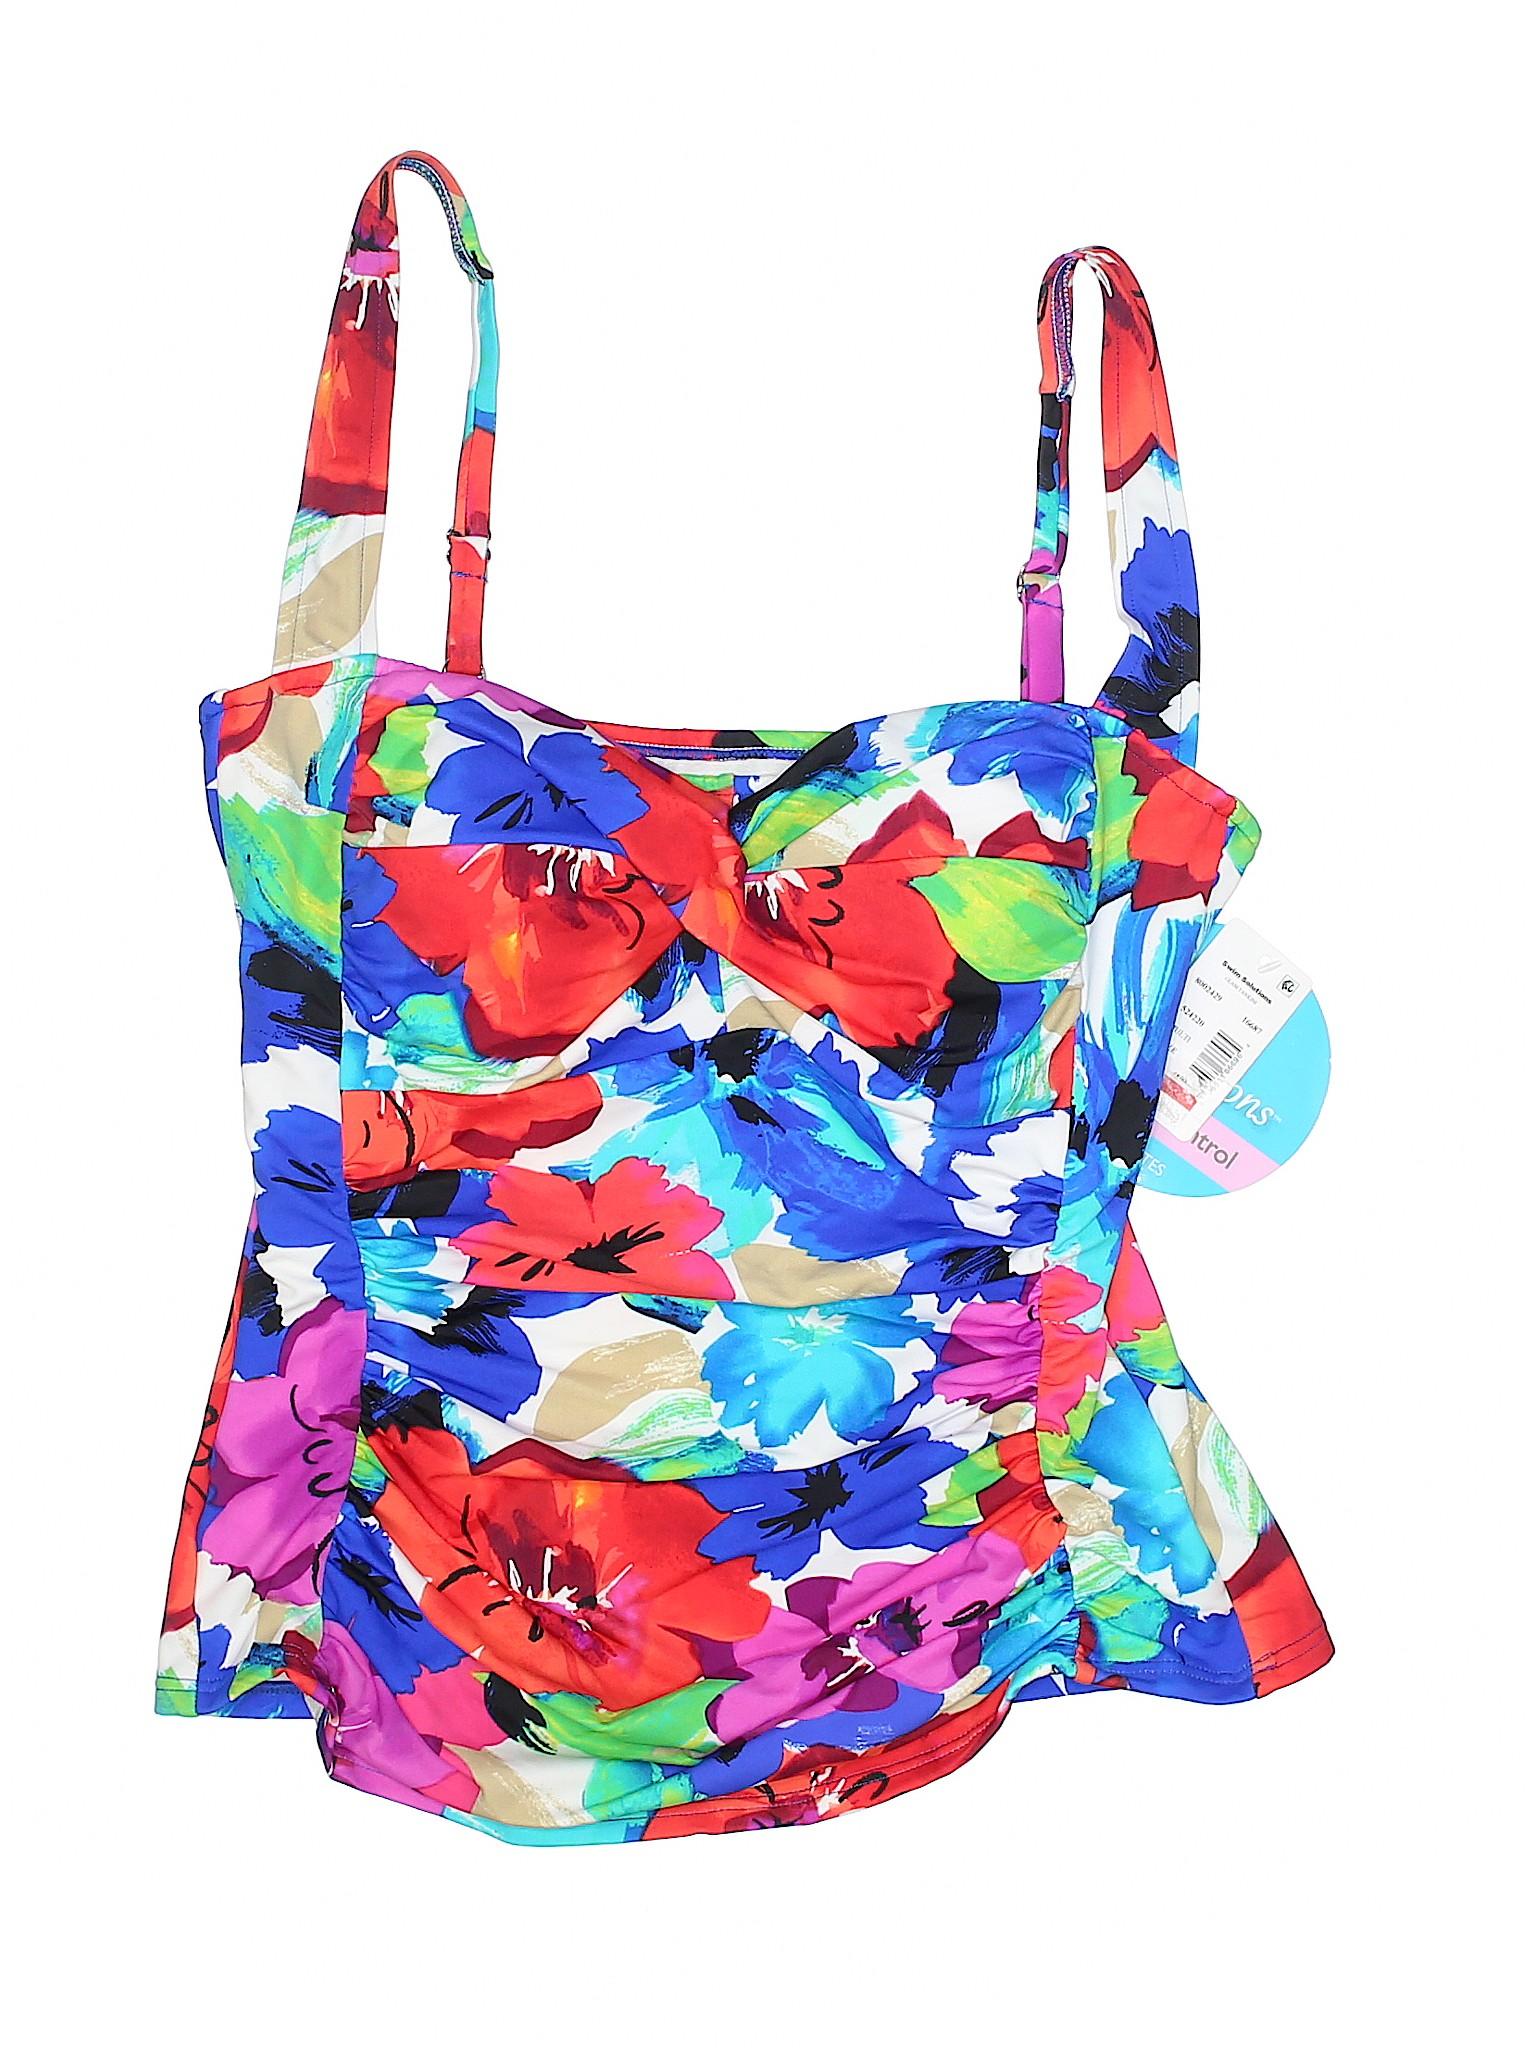 Swimsuit Top Solutions Boutique Swim Boutique Solutions Swimsuit Swim AxqXW0Yg